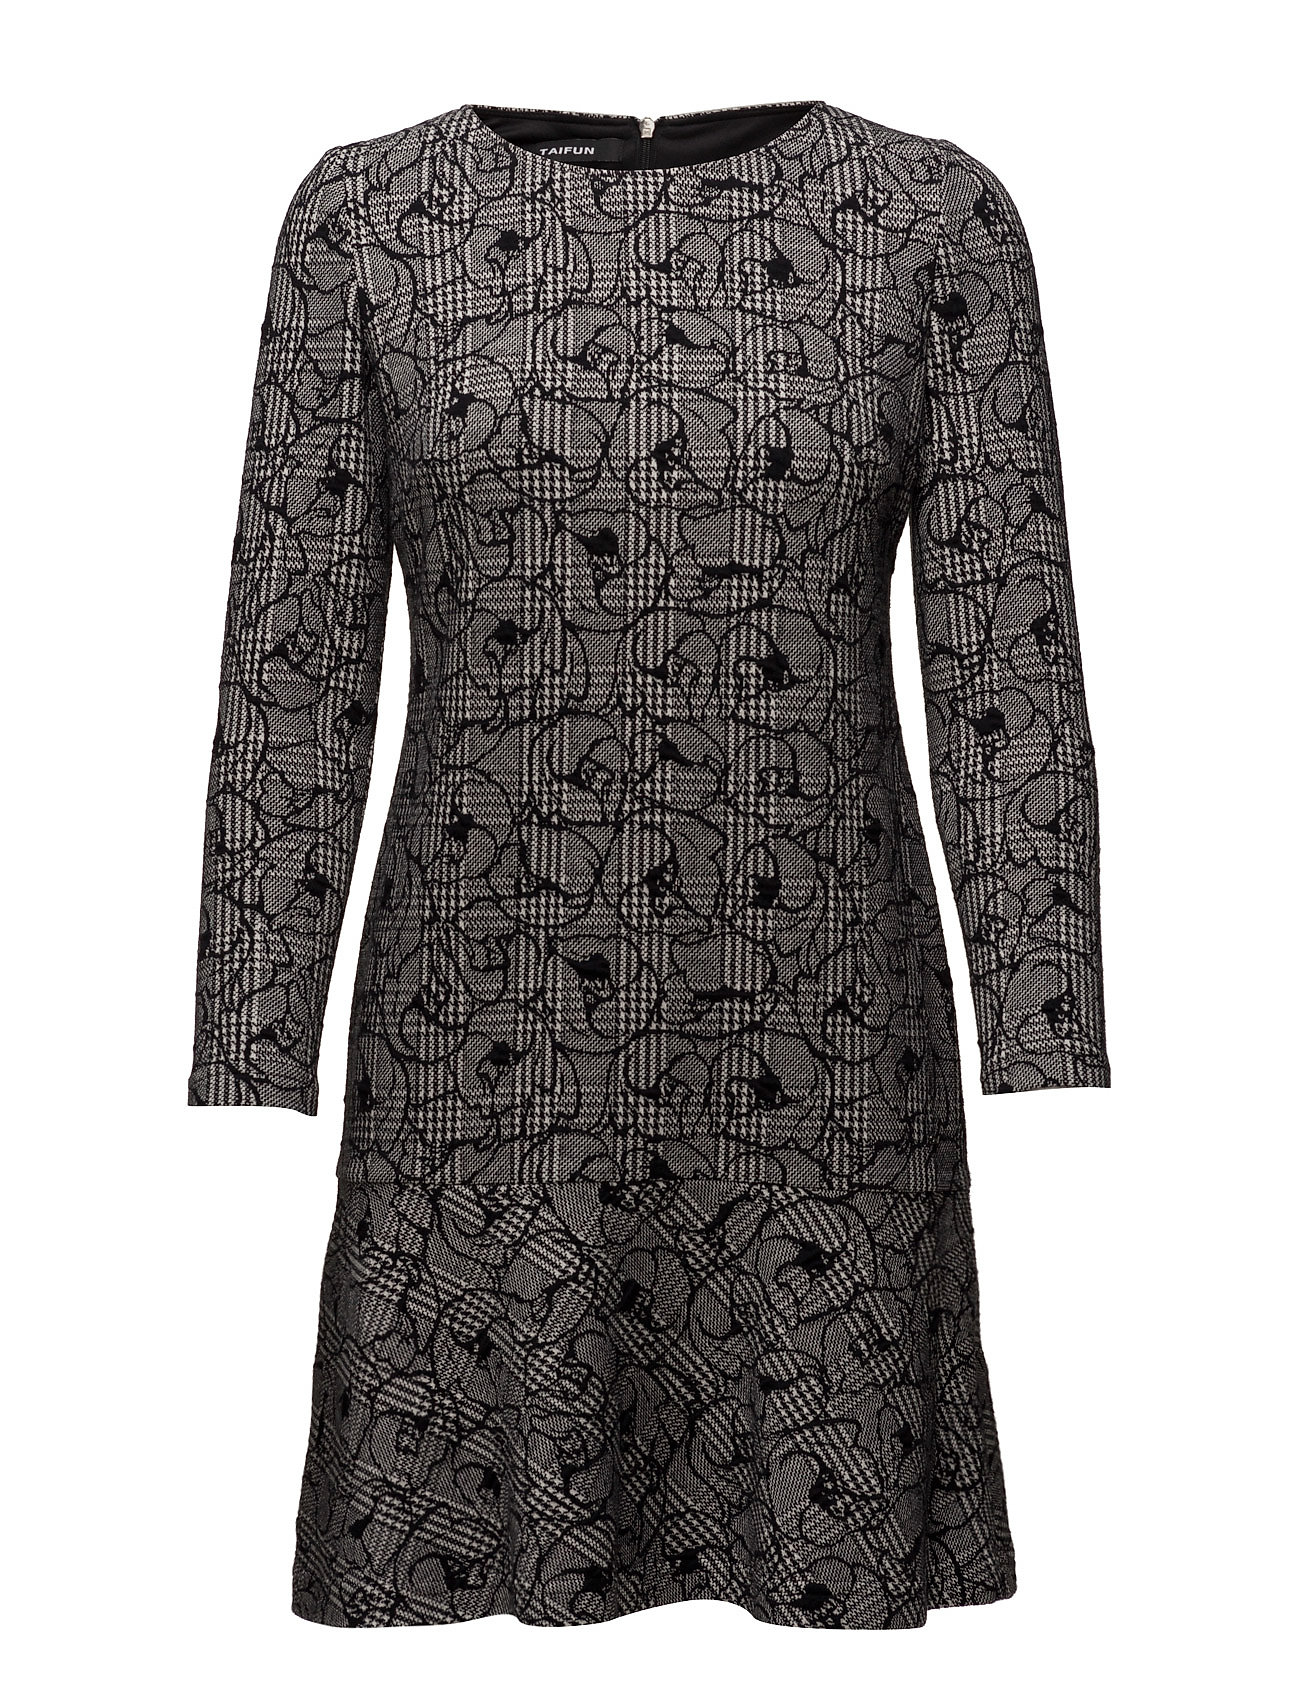 taifun – Dress knitted fabric fra boozt.com dk